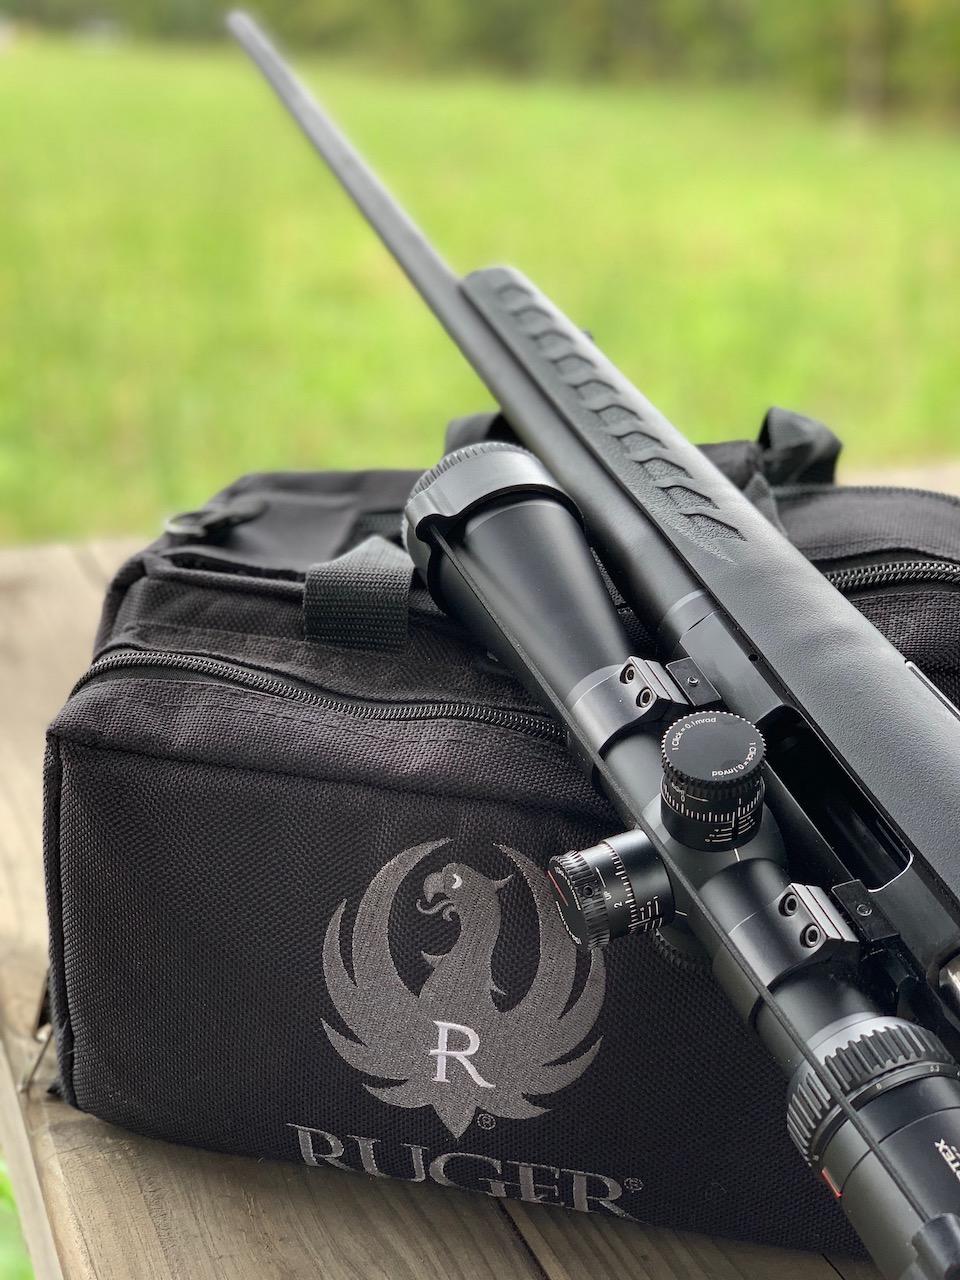 Ruger American rifle and range bag